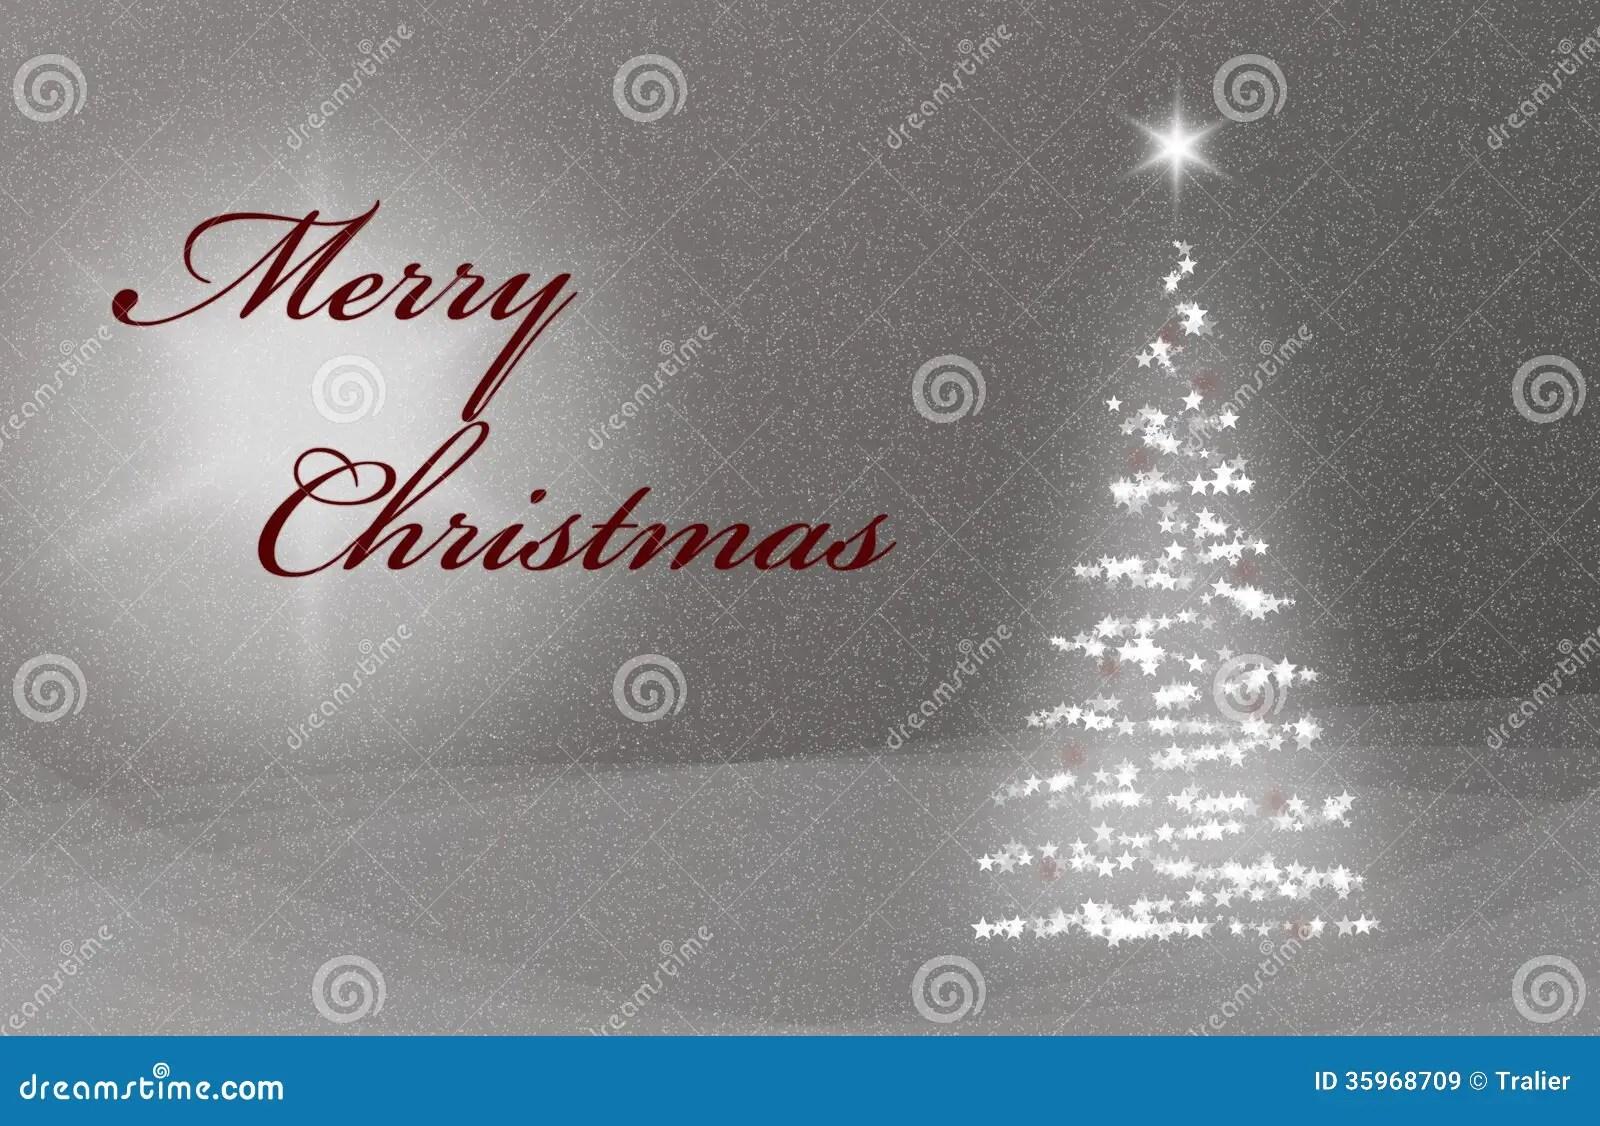 Christmas Card X Mas Card With Christmastree Snow And